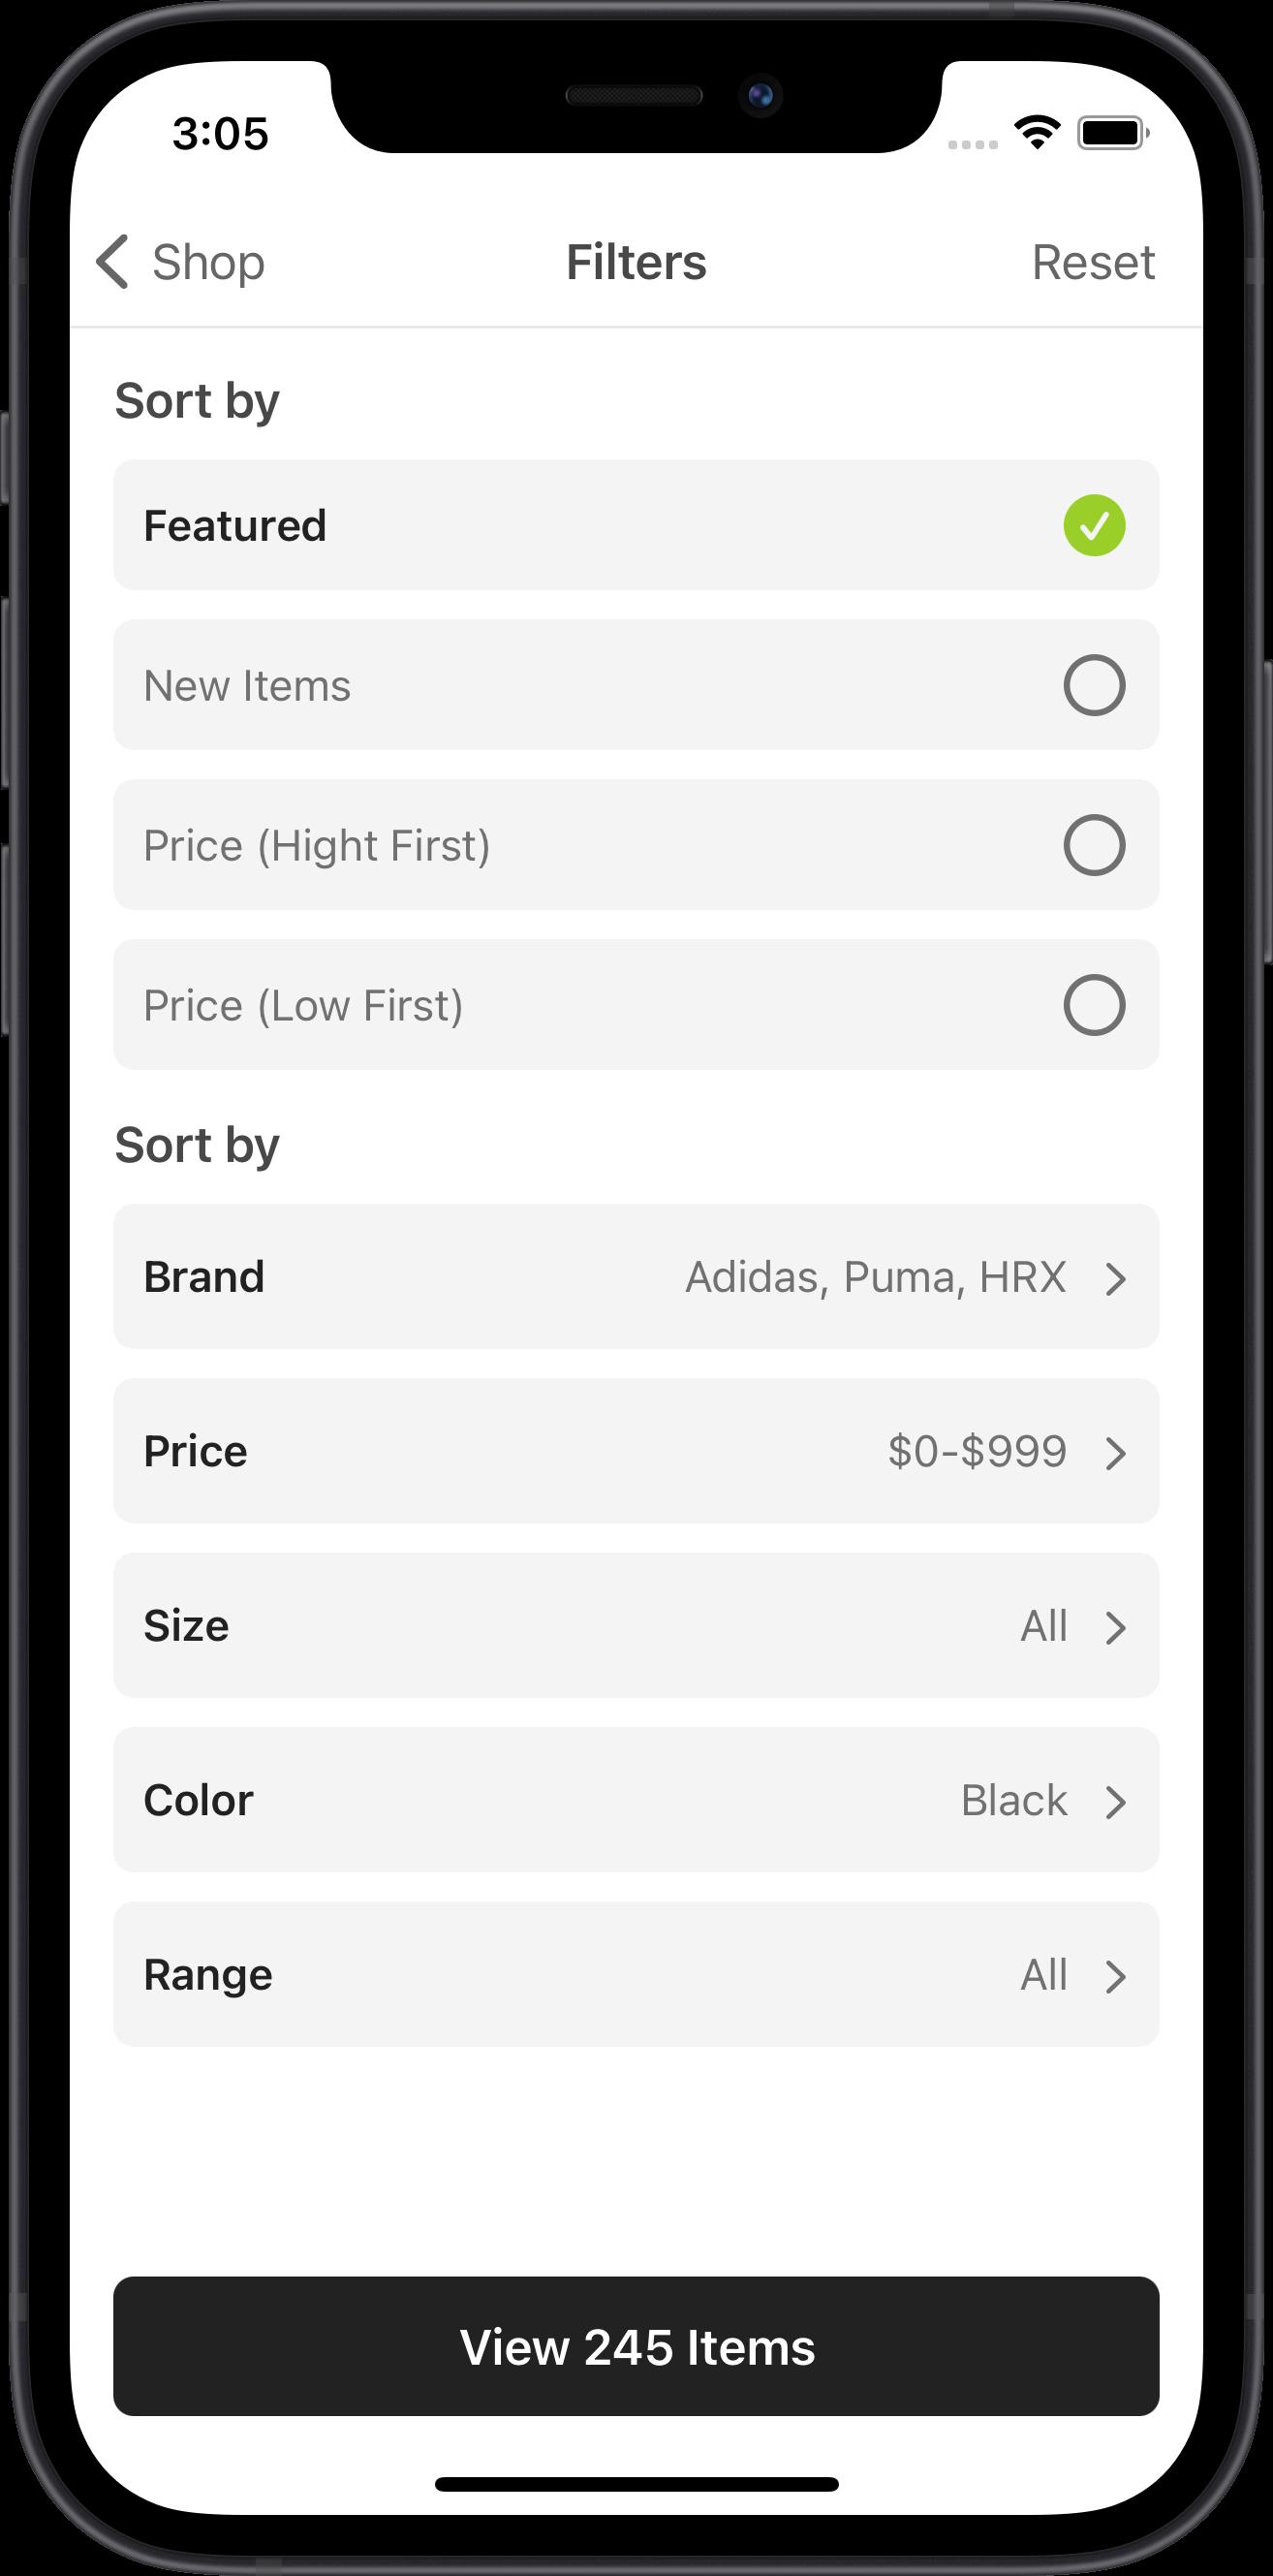 e-commerce, filters, range, adidas